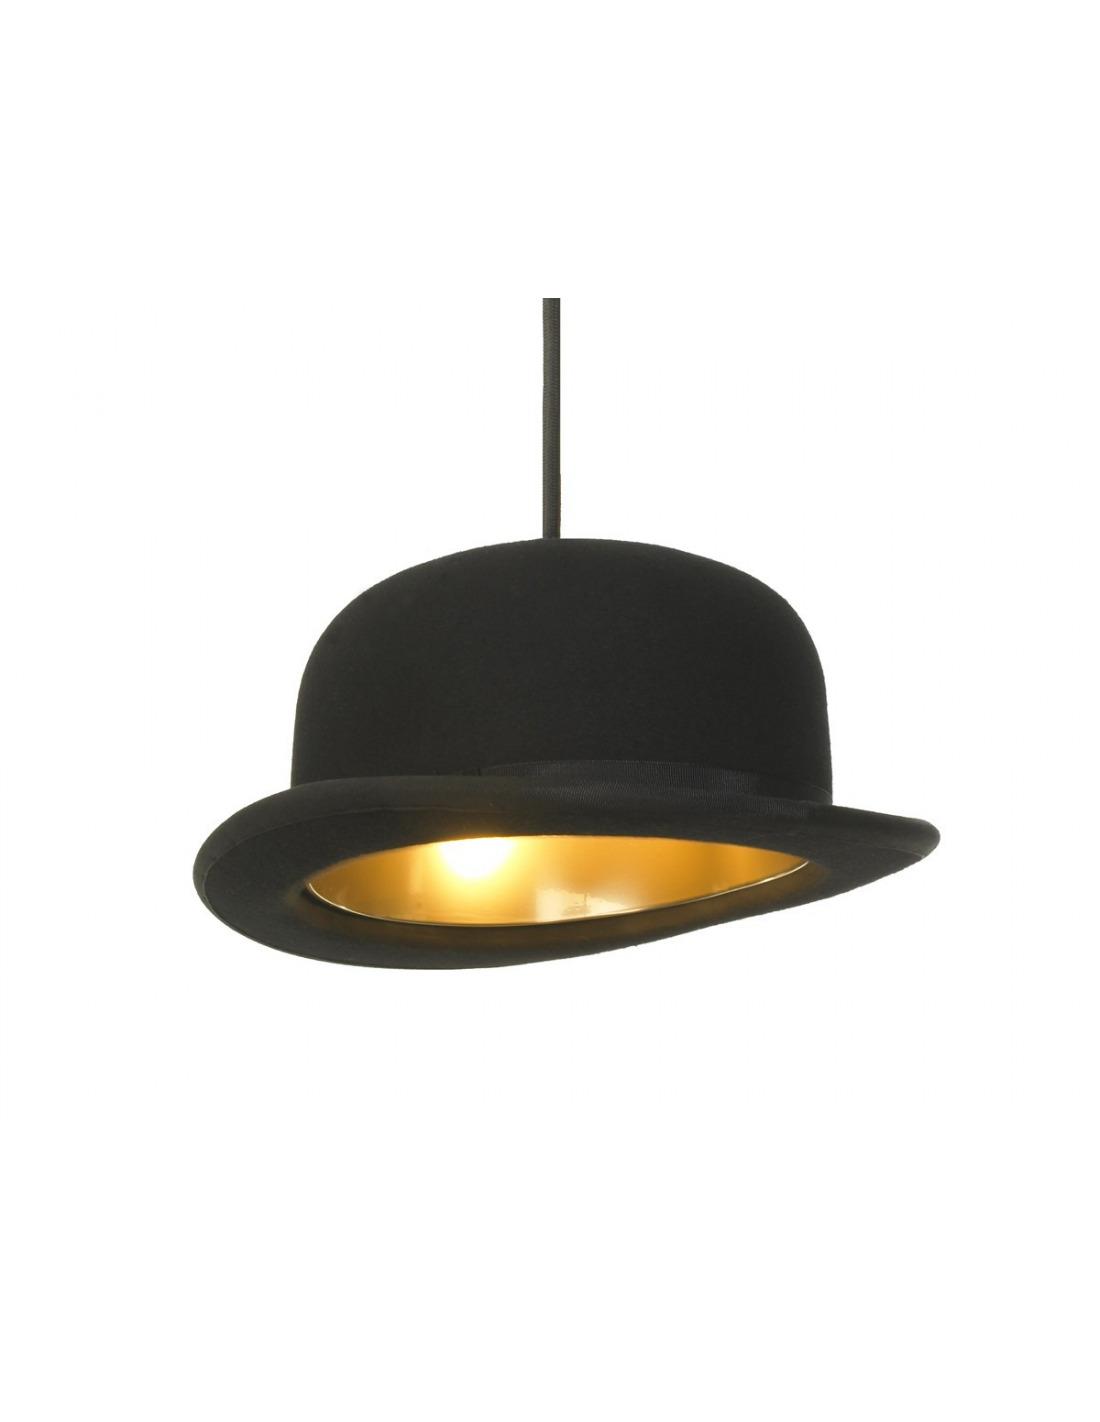 suspension jeeves en forme de chapeau melon par innermost otoko. Black Bedroom Furniture Sets. Home Design Ideas